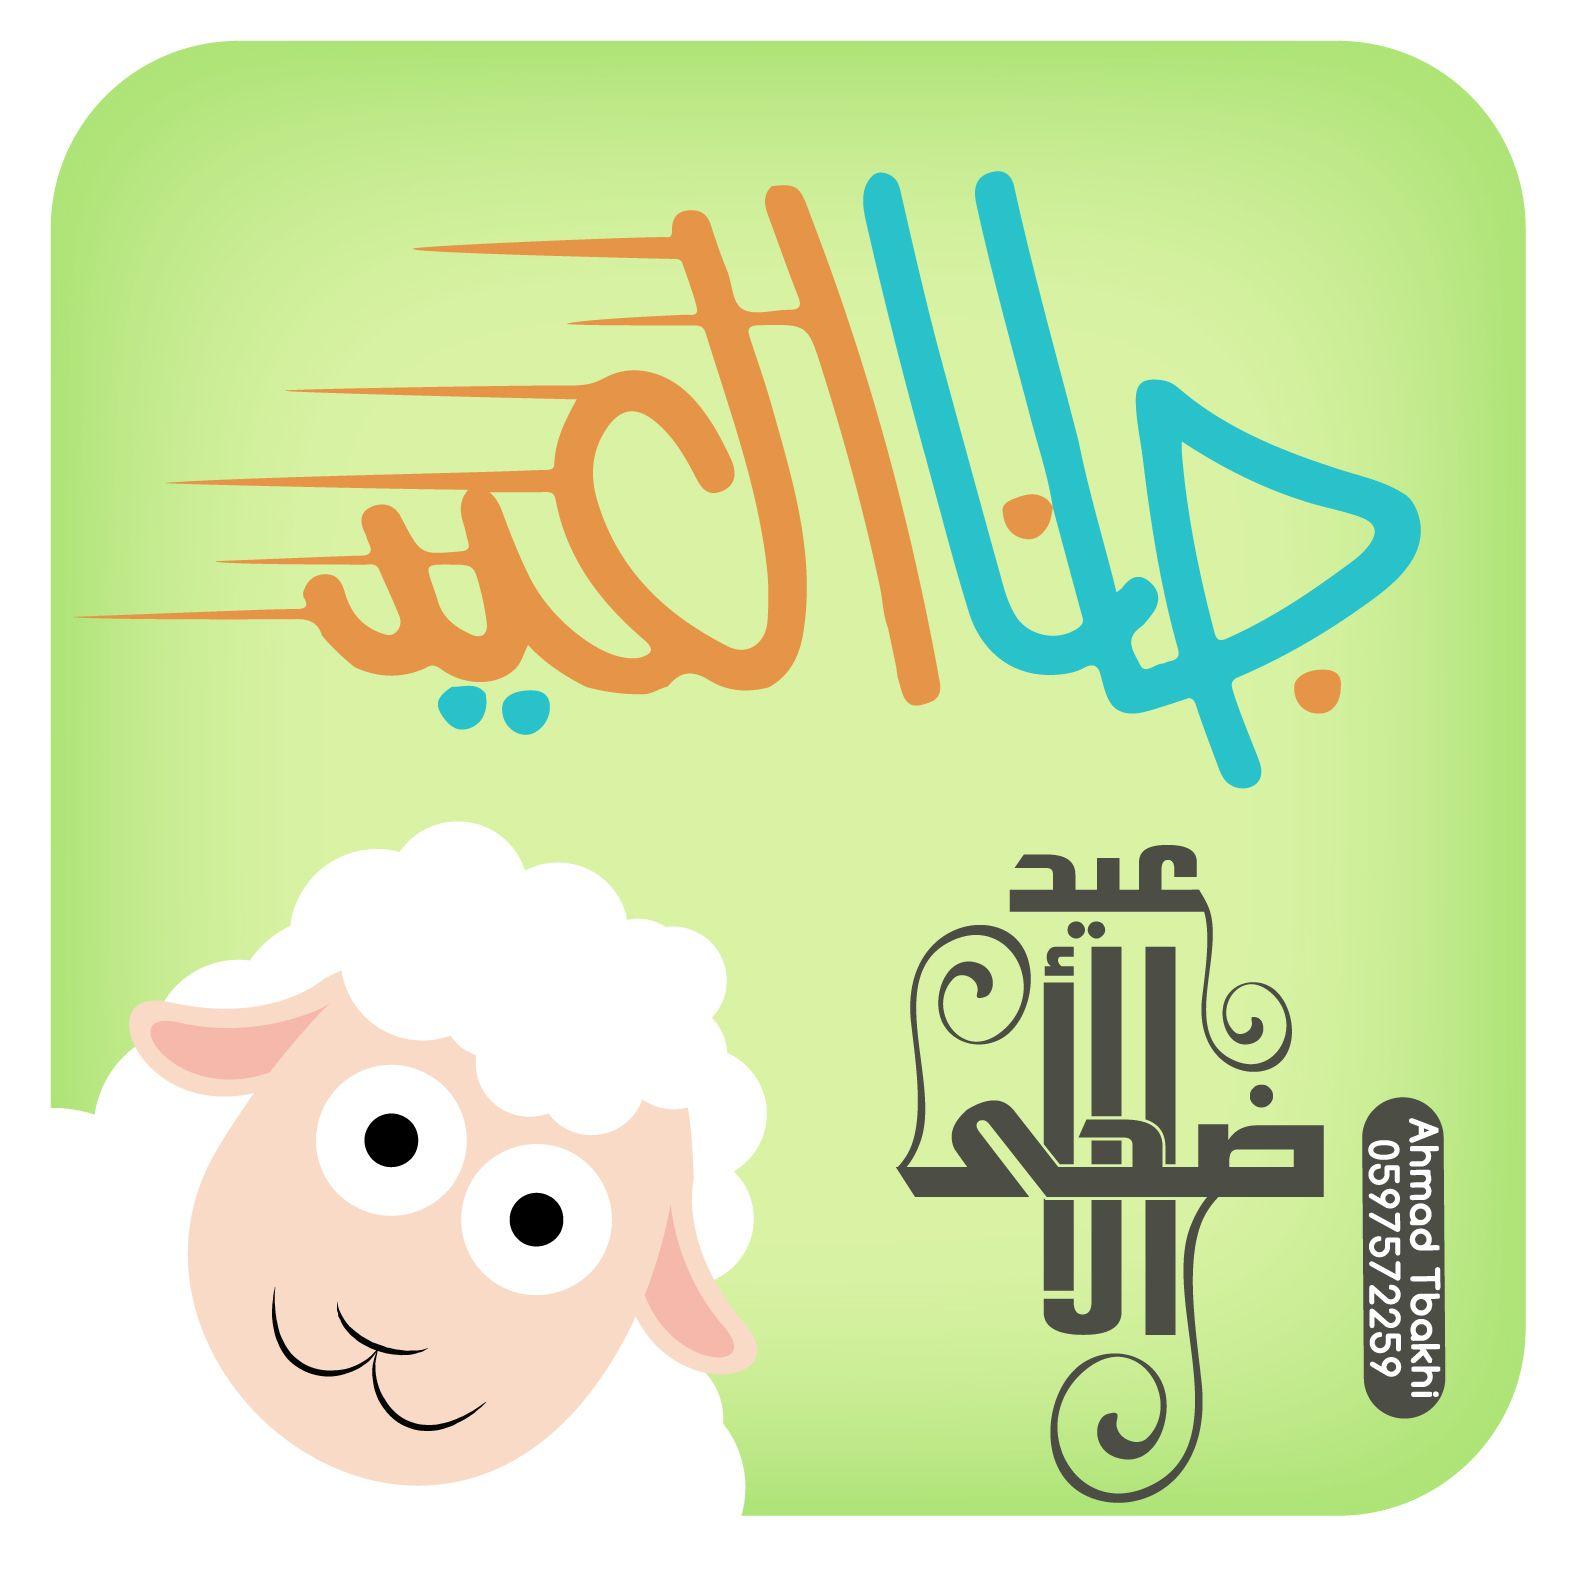 pinahmad graphic designer on eid عيد الاضحى كل عام